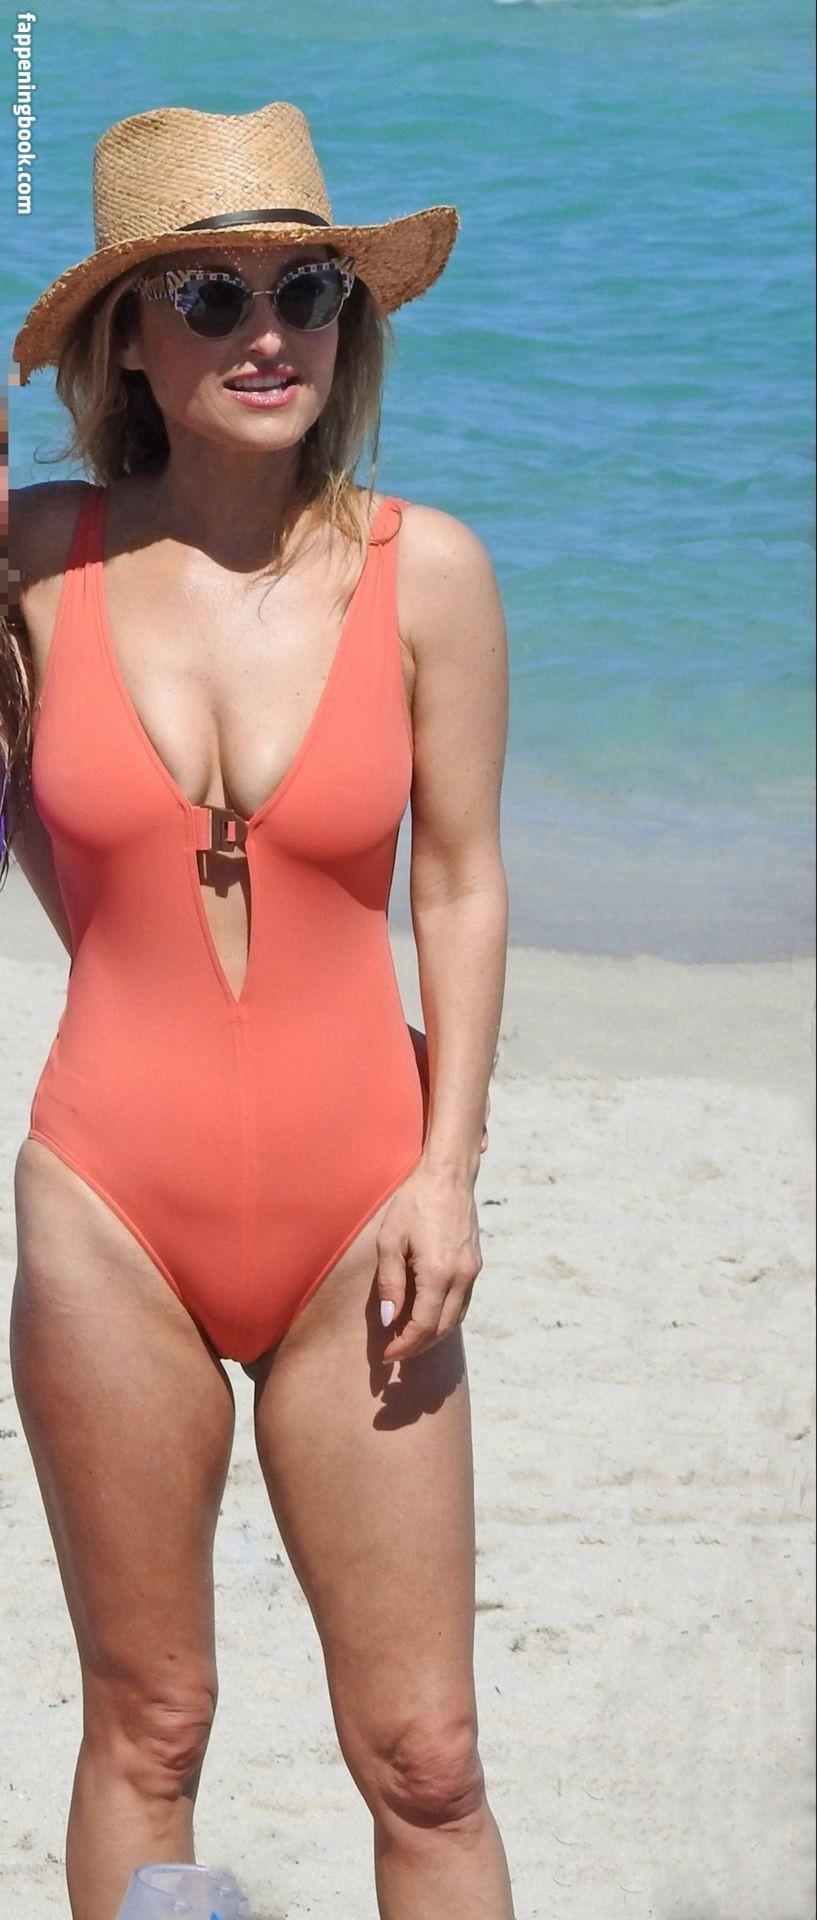 Giada De Laurentiis Nude, Fappening, Sexy Photos, Uncensored - FappeningBook